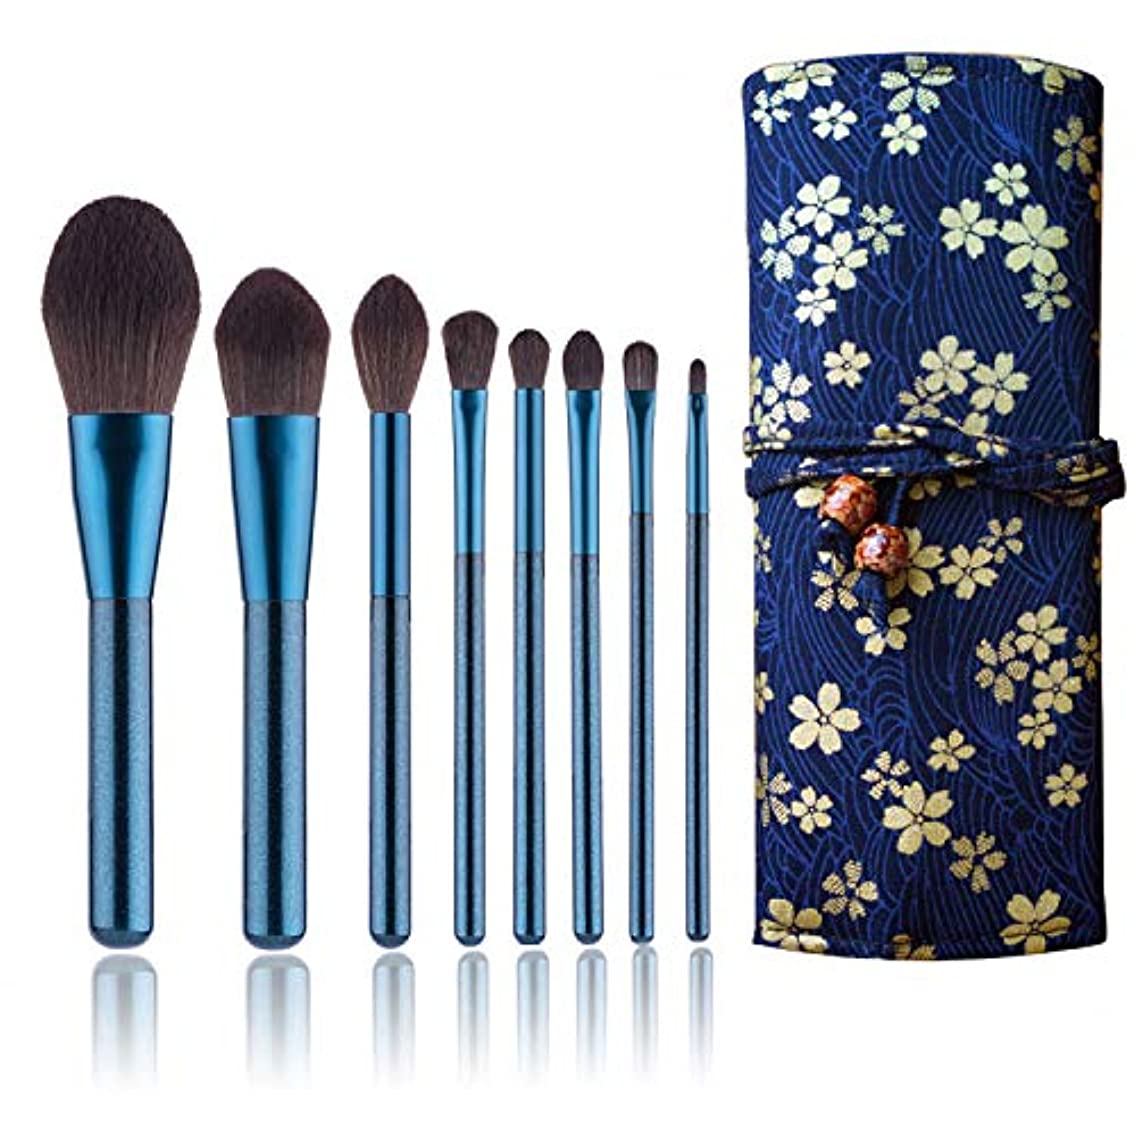 ZOE·Y メイクブラシ 8本セット 化粧ブラシ 柔らかい 化粧筆 可愛い 化粧ポーチ付き 携帯便利 誕生日プレゼントゃギフトにもおすすめ makeup brushes